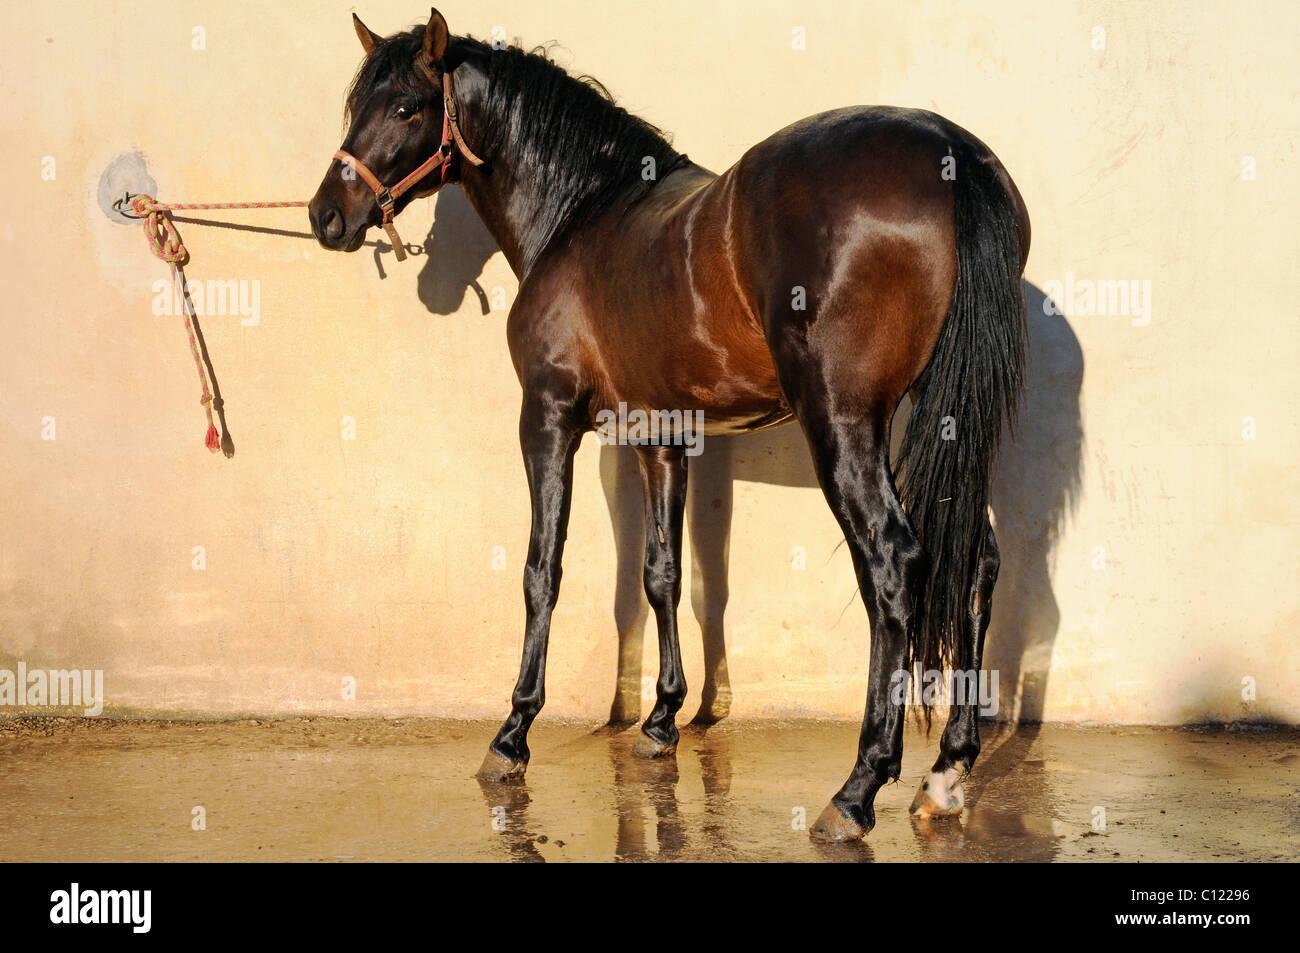 Horse, shiny coat, stables, horse riding, stud farm, Costa Blanca, Alicante province, Spain, Europe - Stock Image